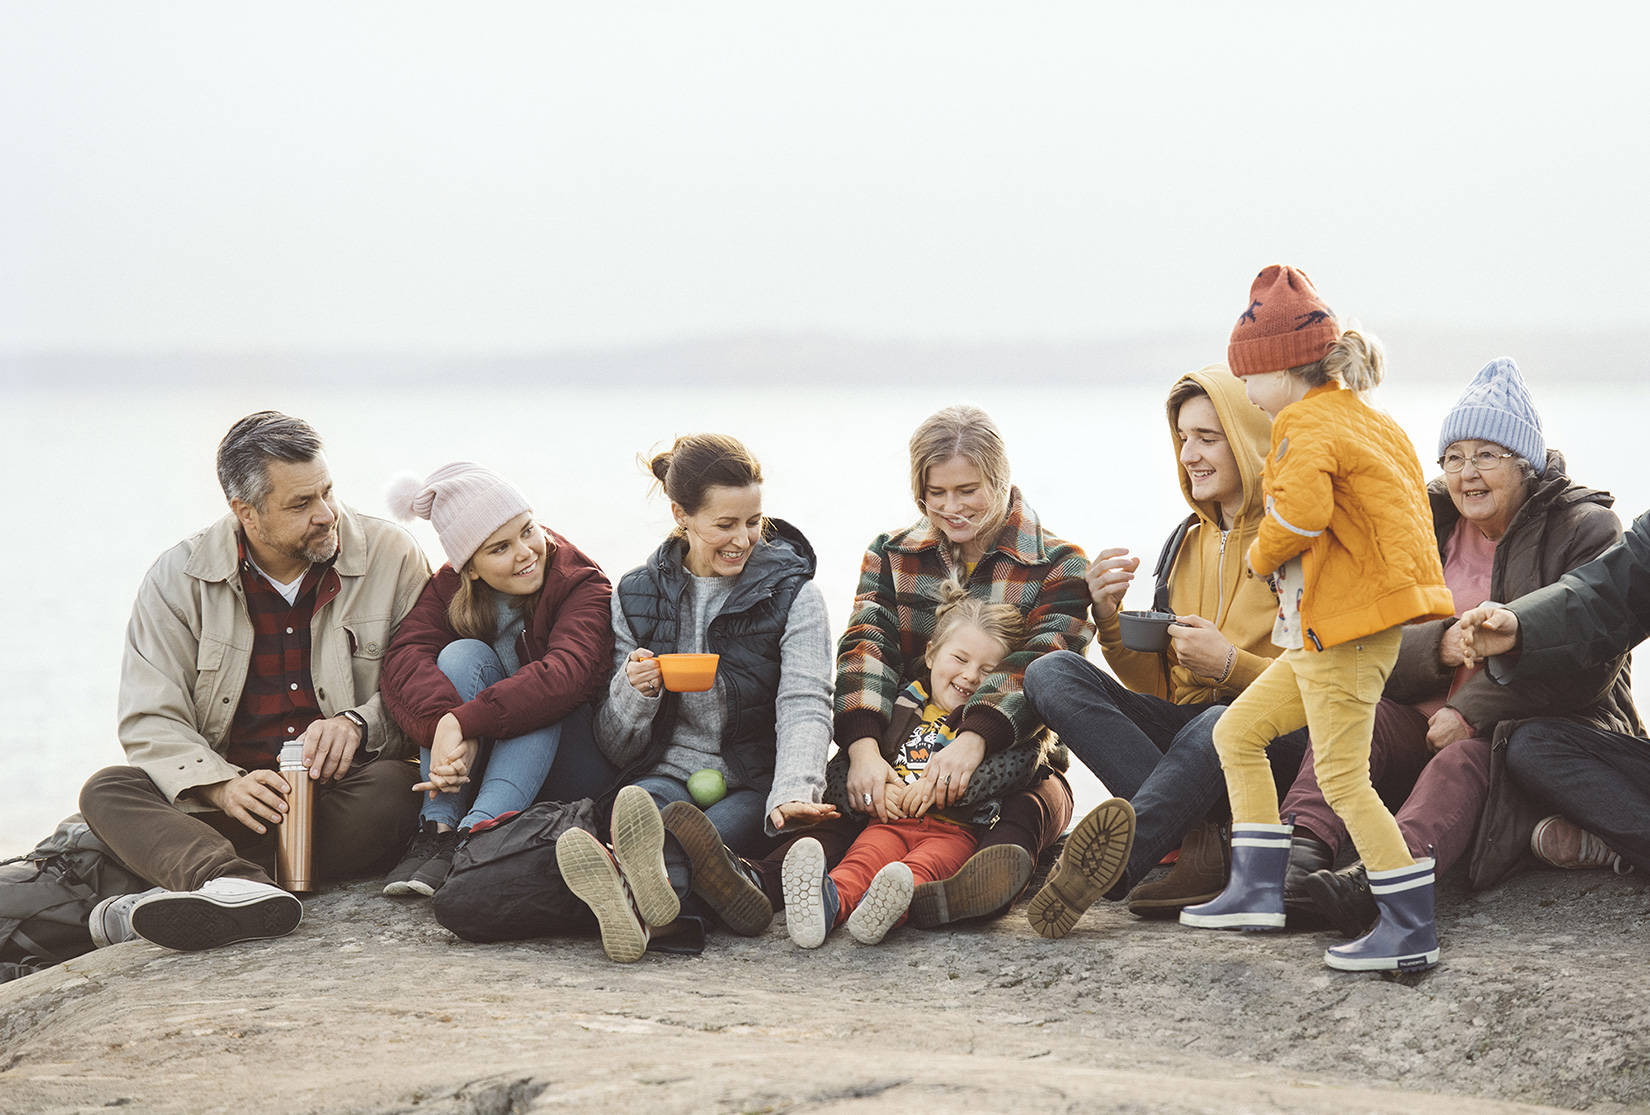 Happy-FB_Swedbank_Imagery_Together_10